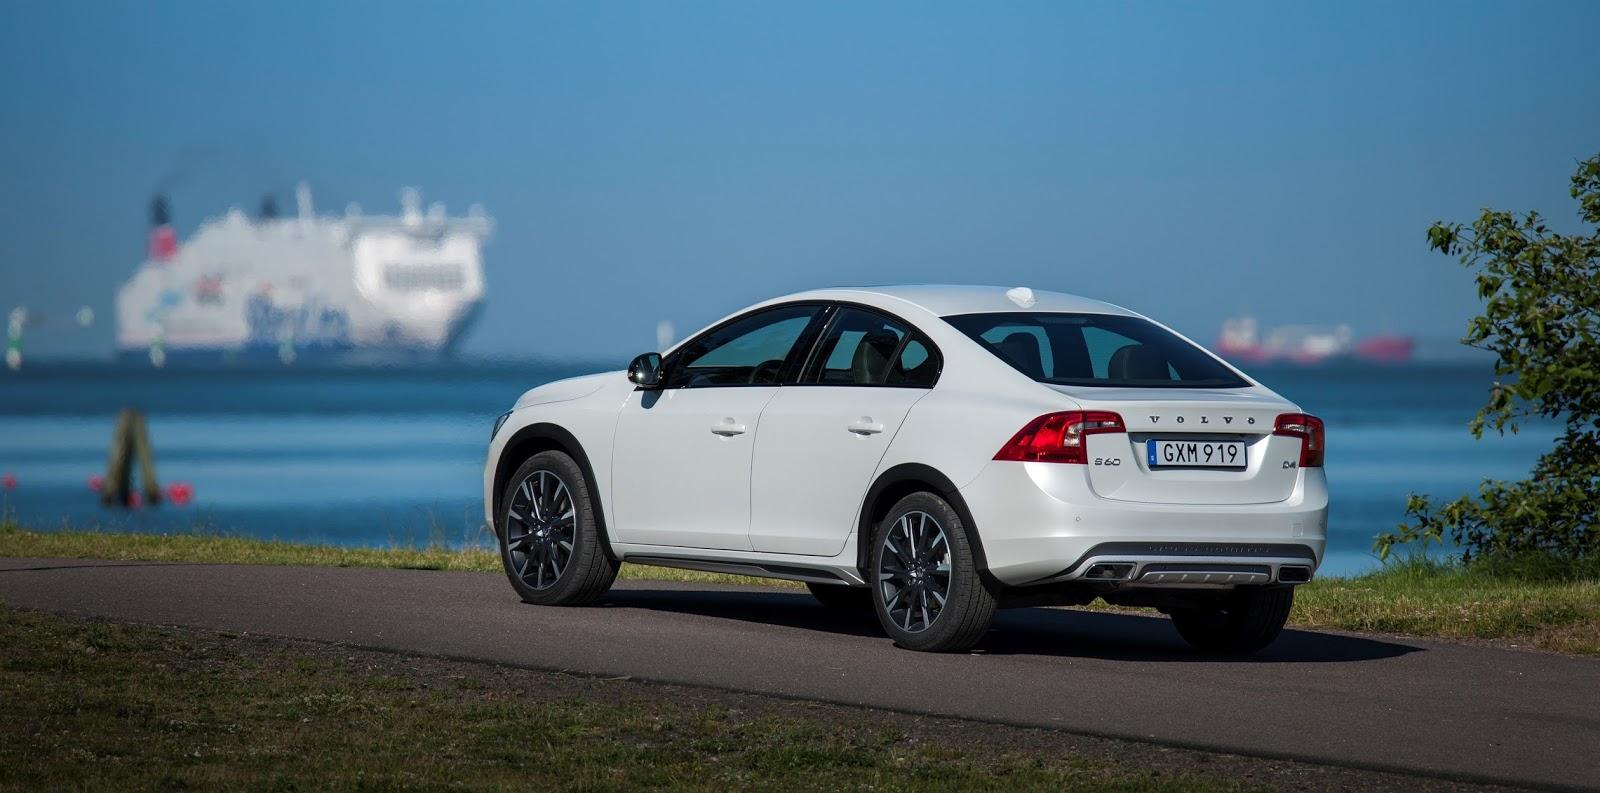 VOLVO%2BS60%2BCROSS%2BCOUNTRY%2B6 Η Volvo με το νέο S60 Cross Country δημιουργεί το πρώτο sedan με διττό χαρακτήρα